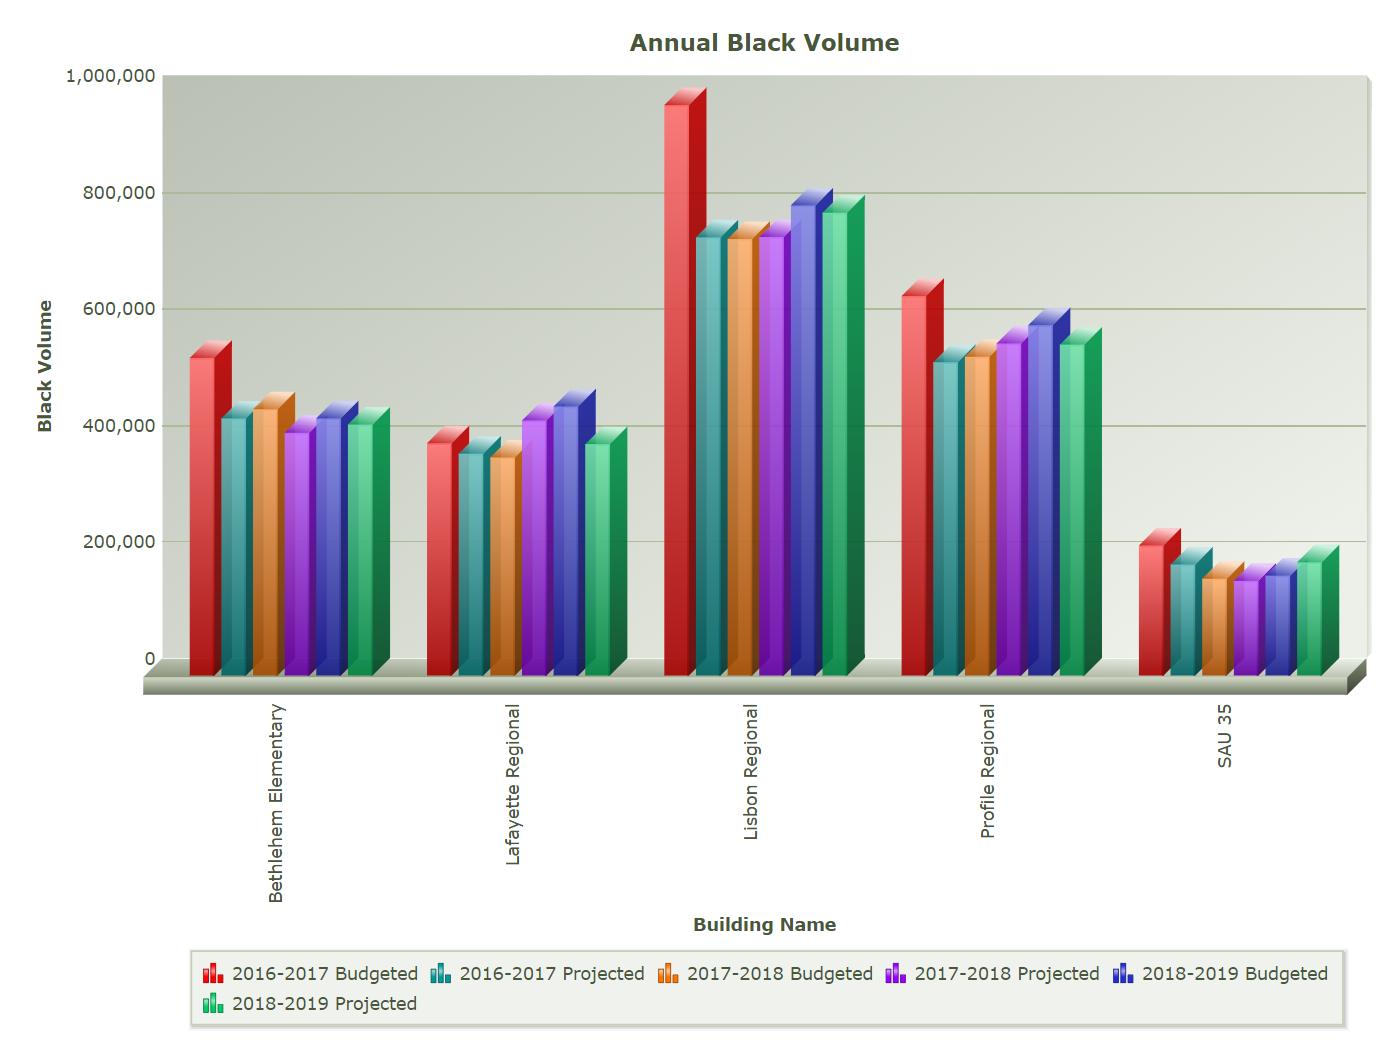 SPC STARDoc annual black volume chart